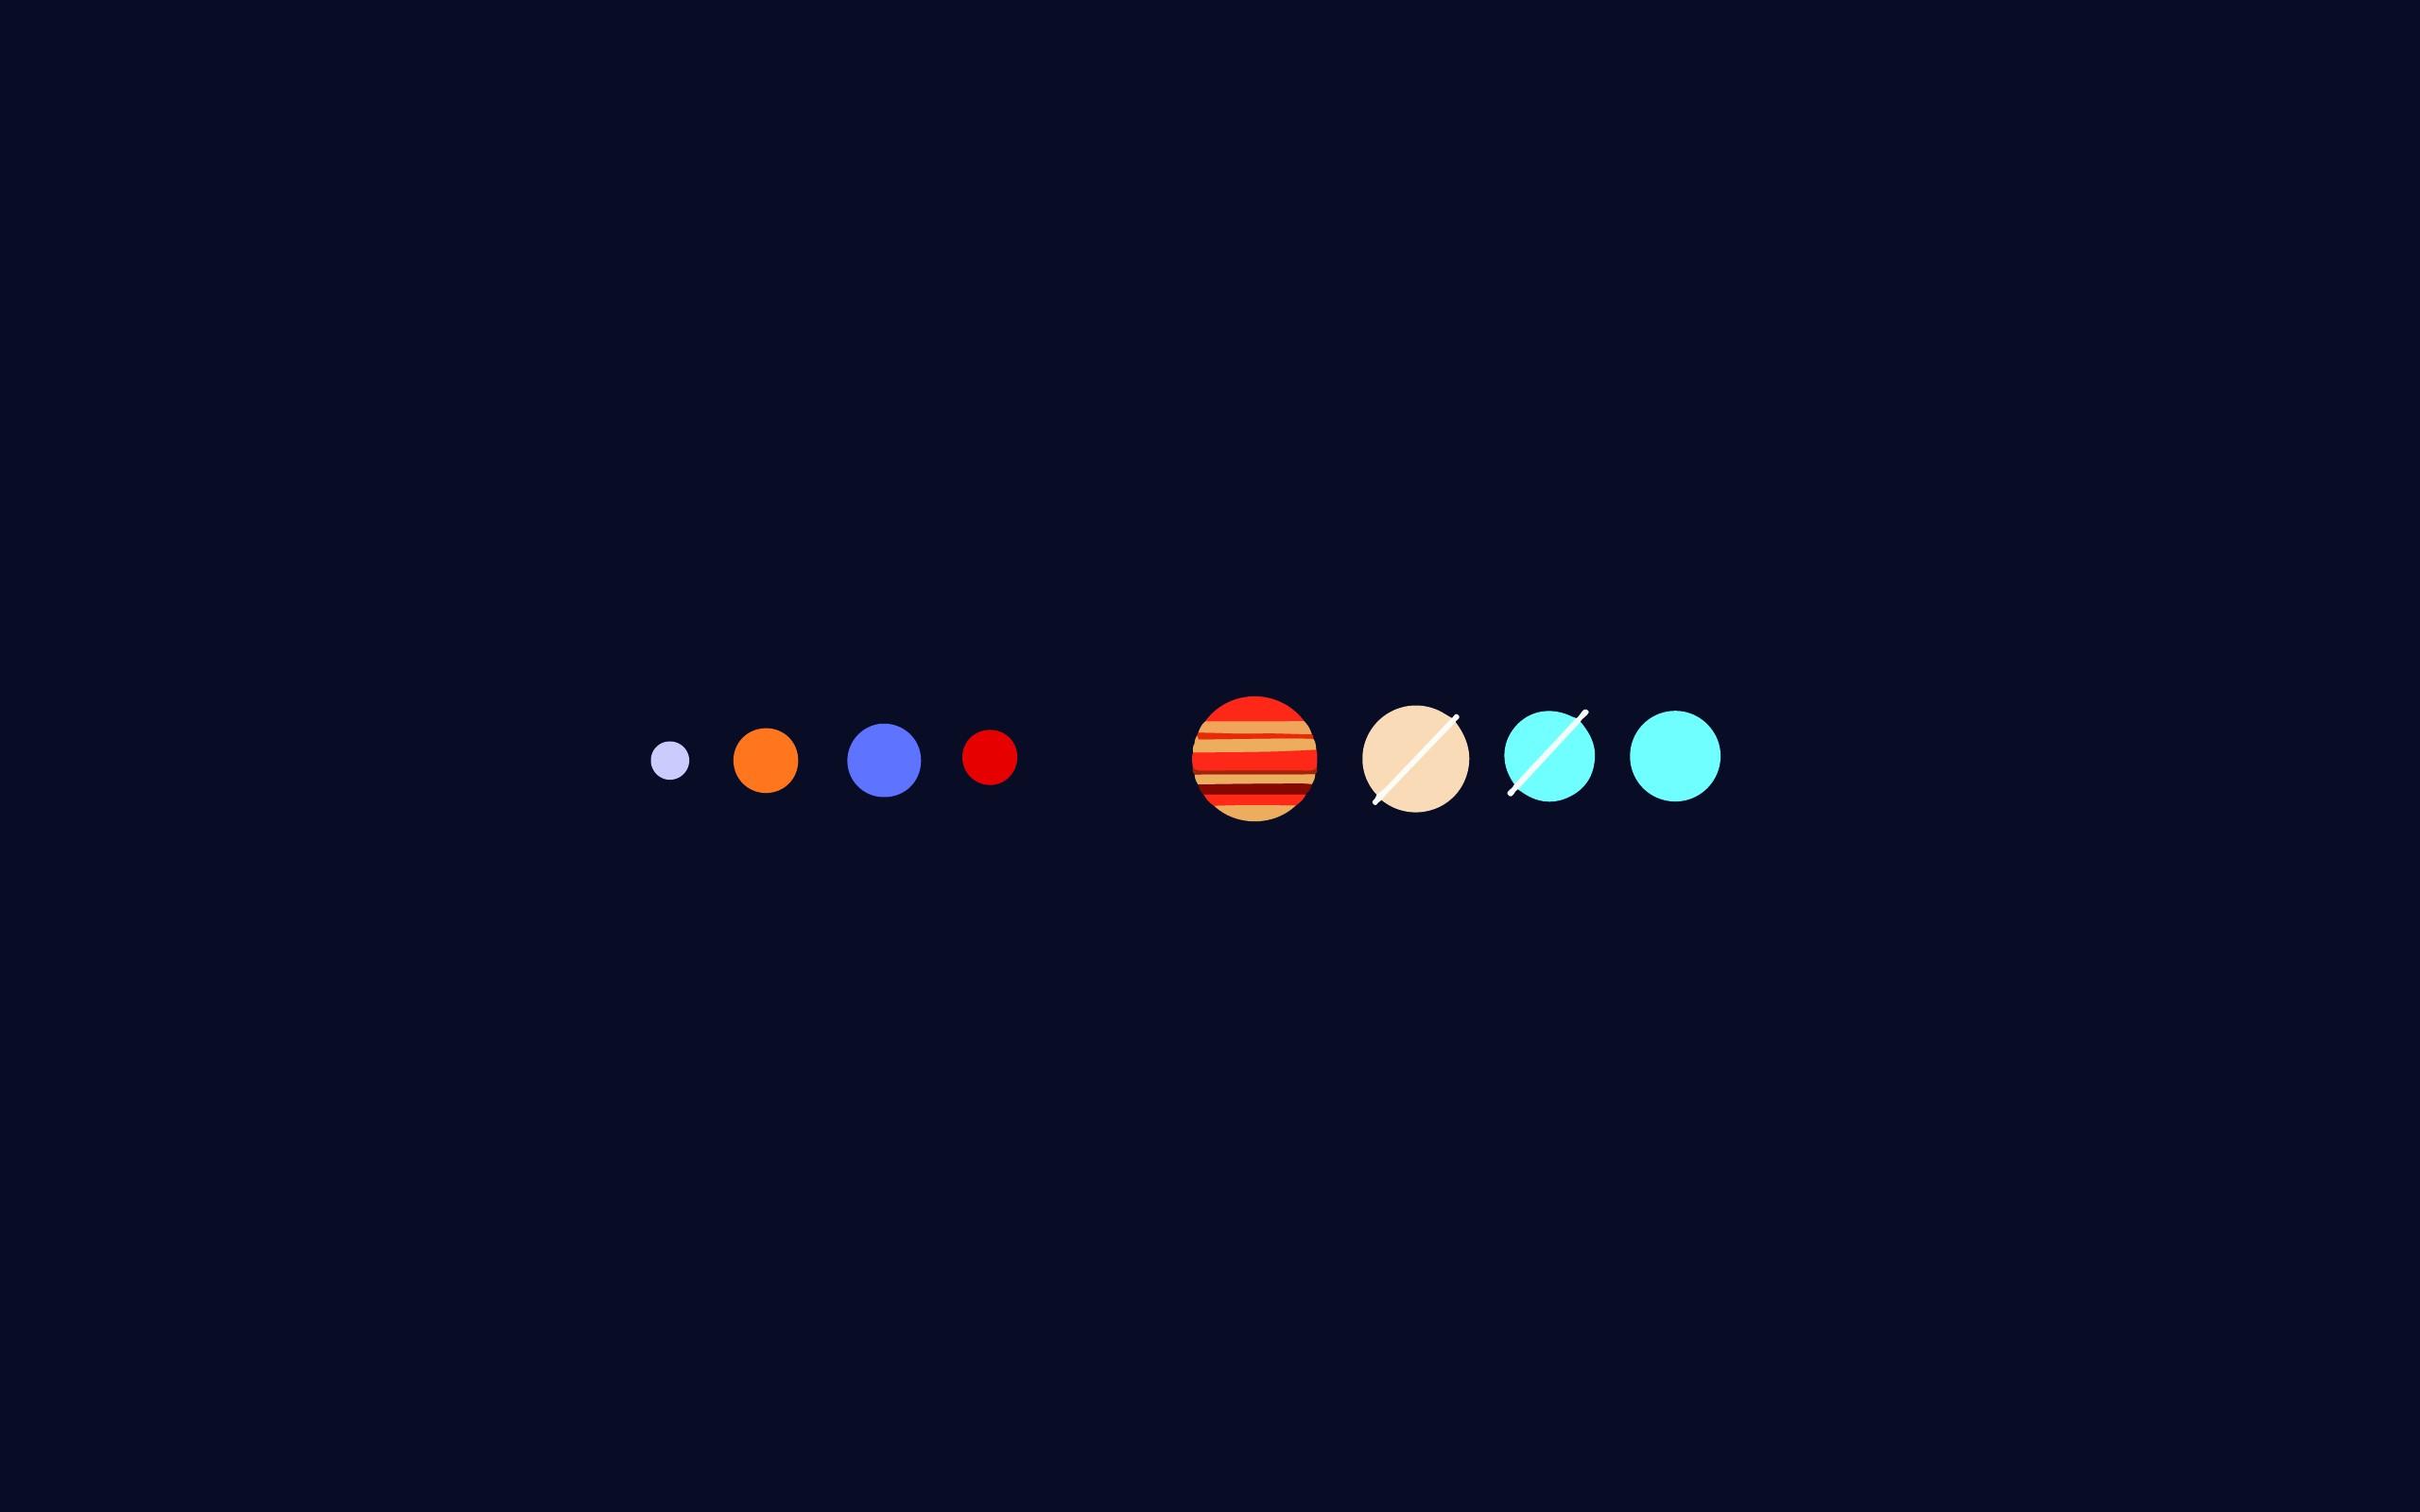 The Solar system [2560x1600] iimgurcom 2560x1600